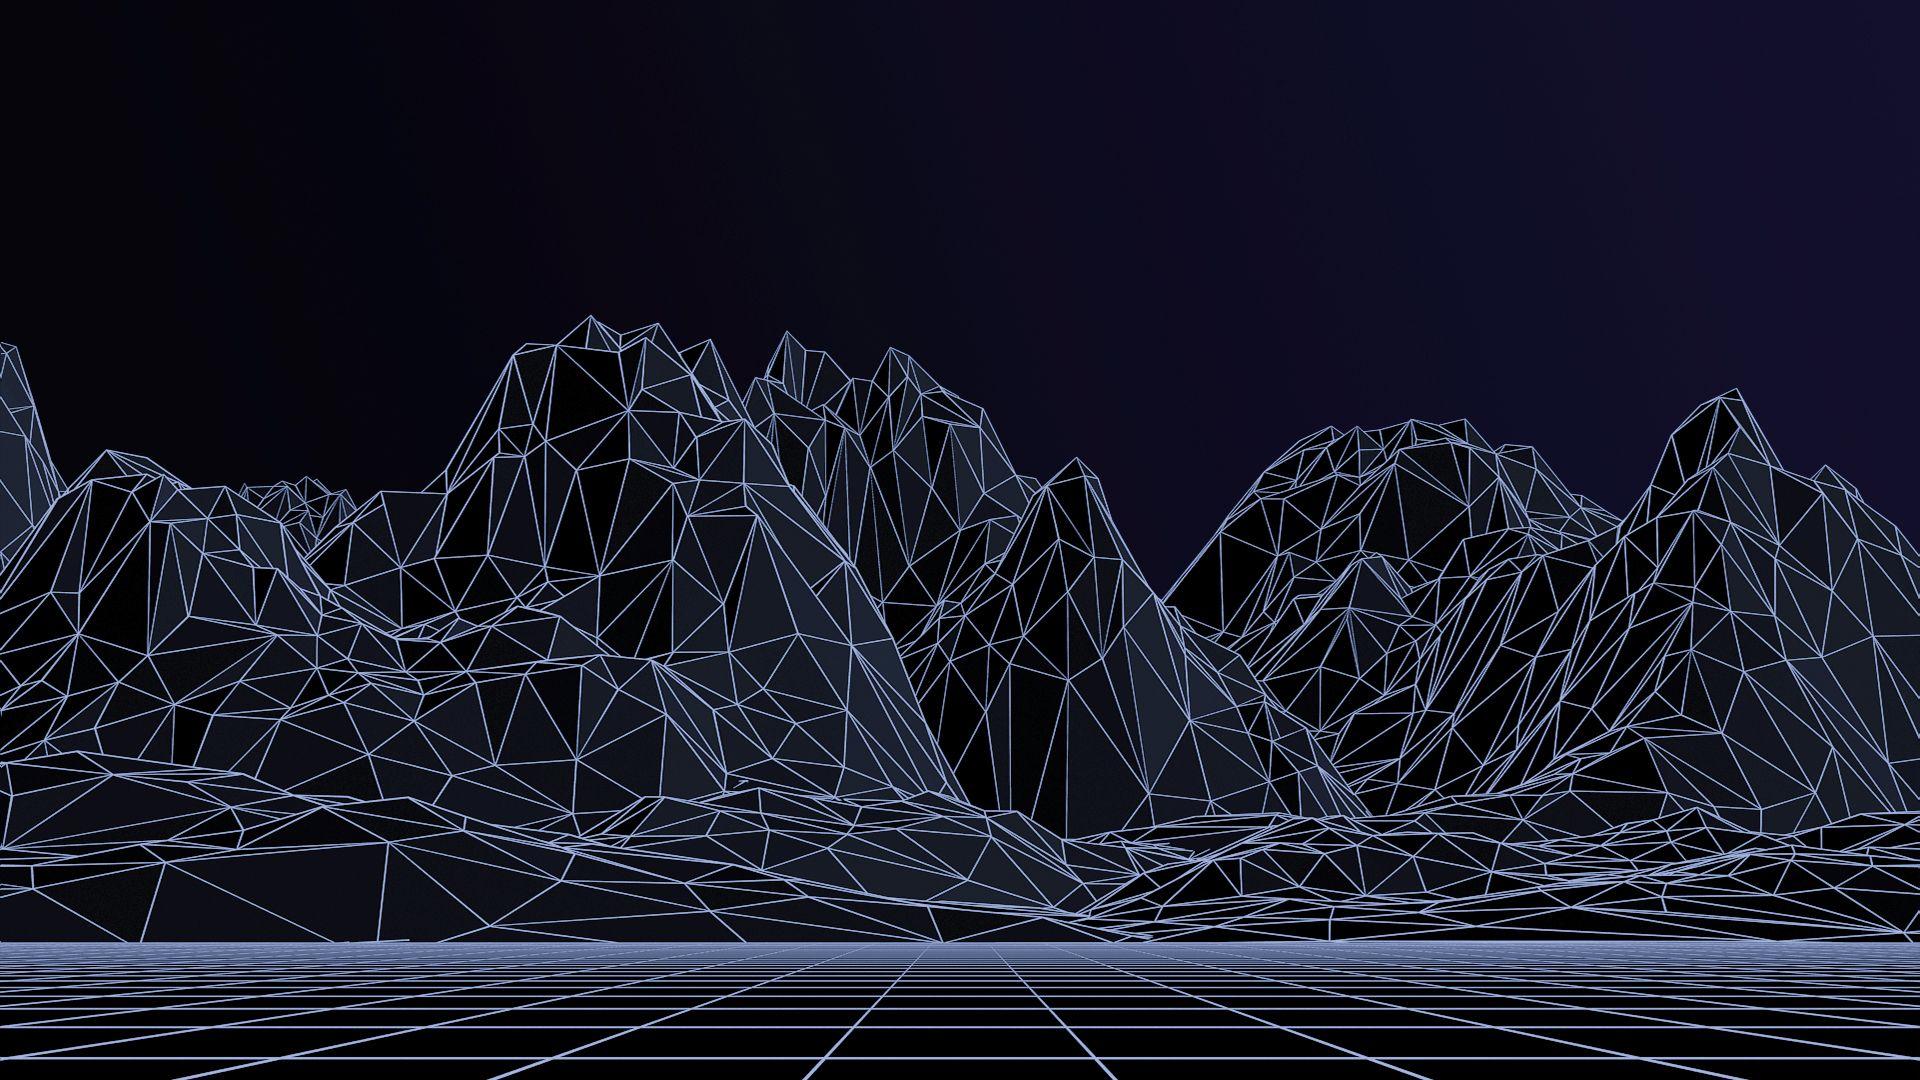 Digital Triangle Landscape Wallpaper 4 Elements